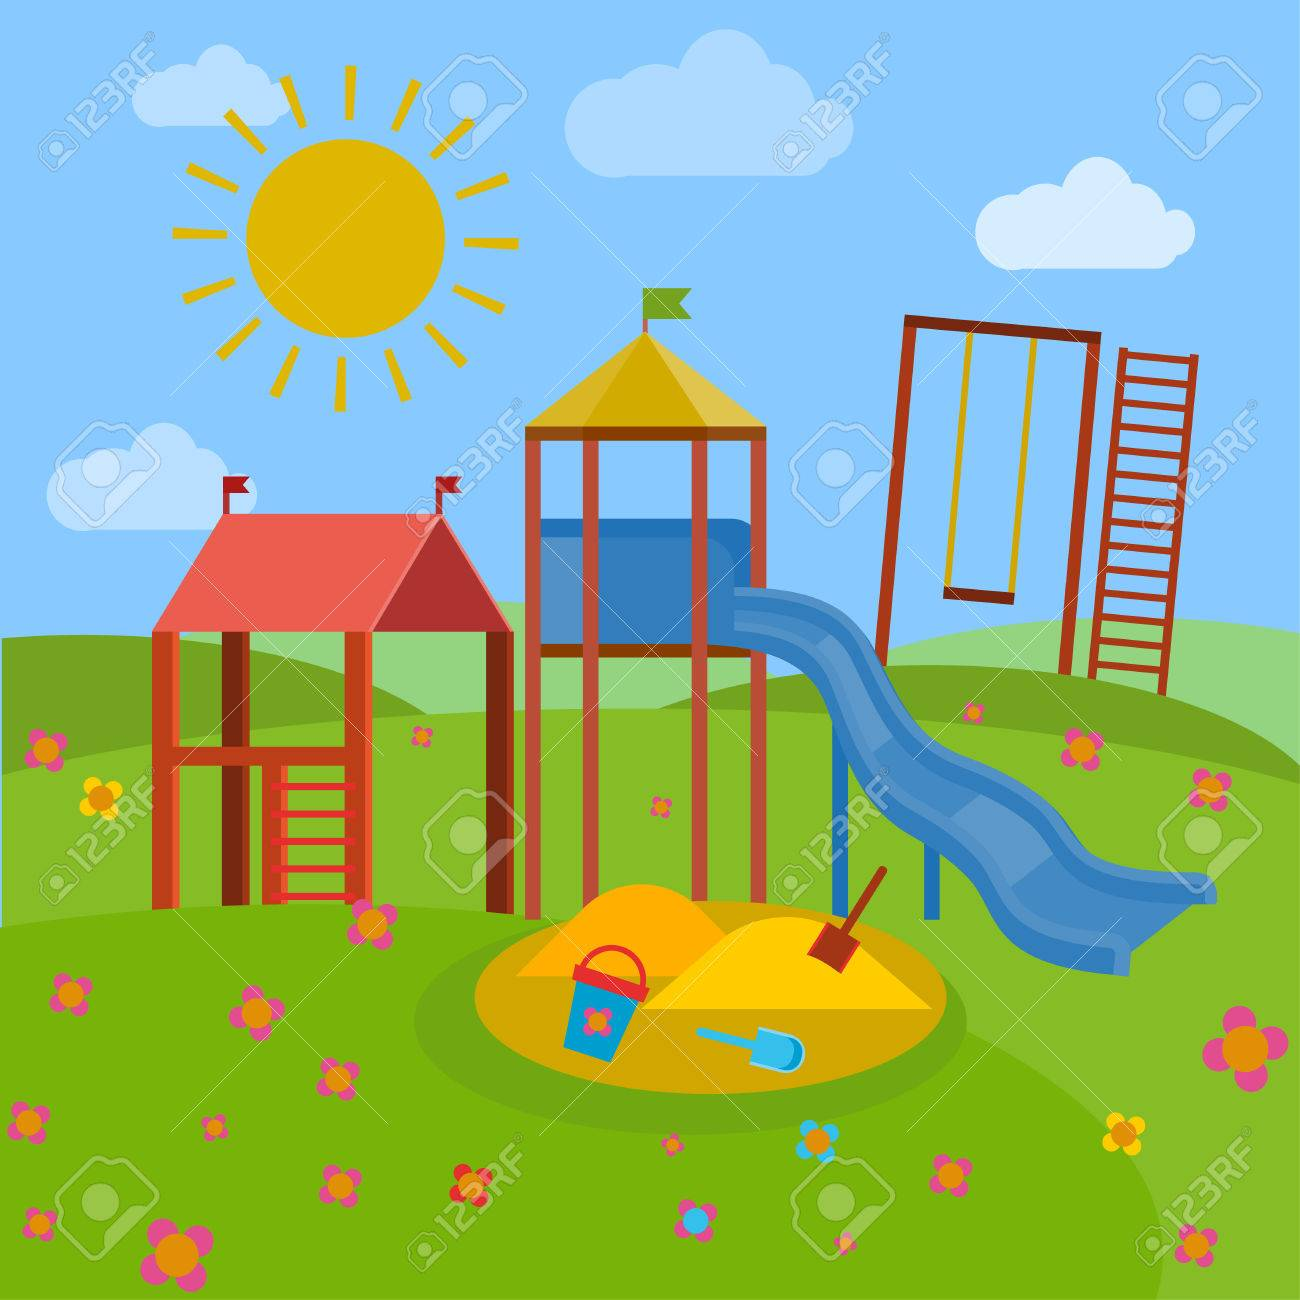 Dibujo De Parque Con Columpio Buscar Con Google Parque Dibujo Hombre Arana Para Pintar Parques